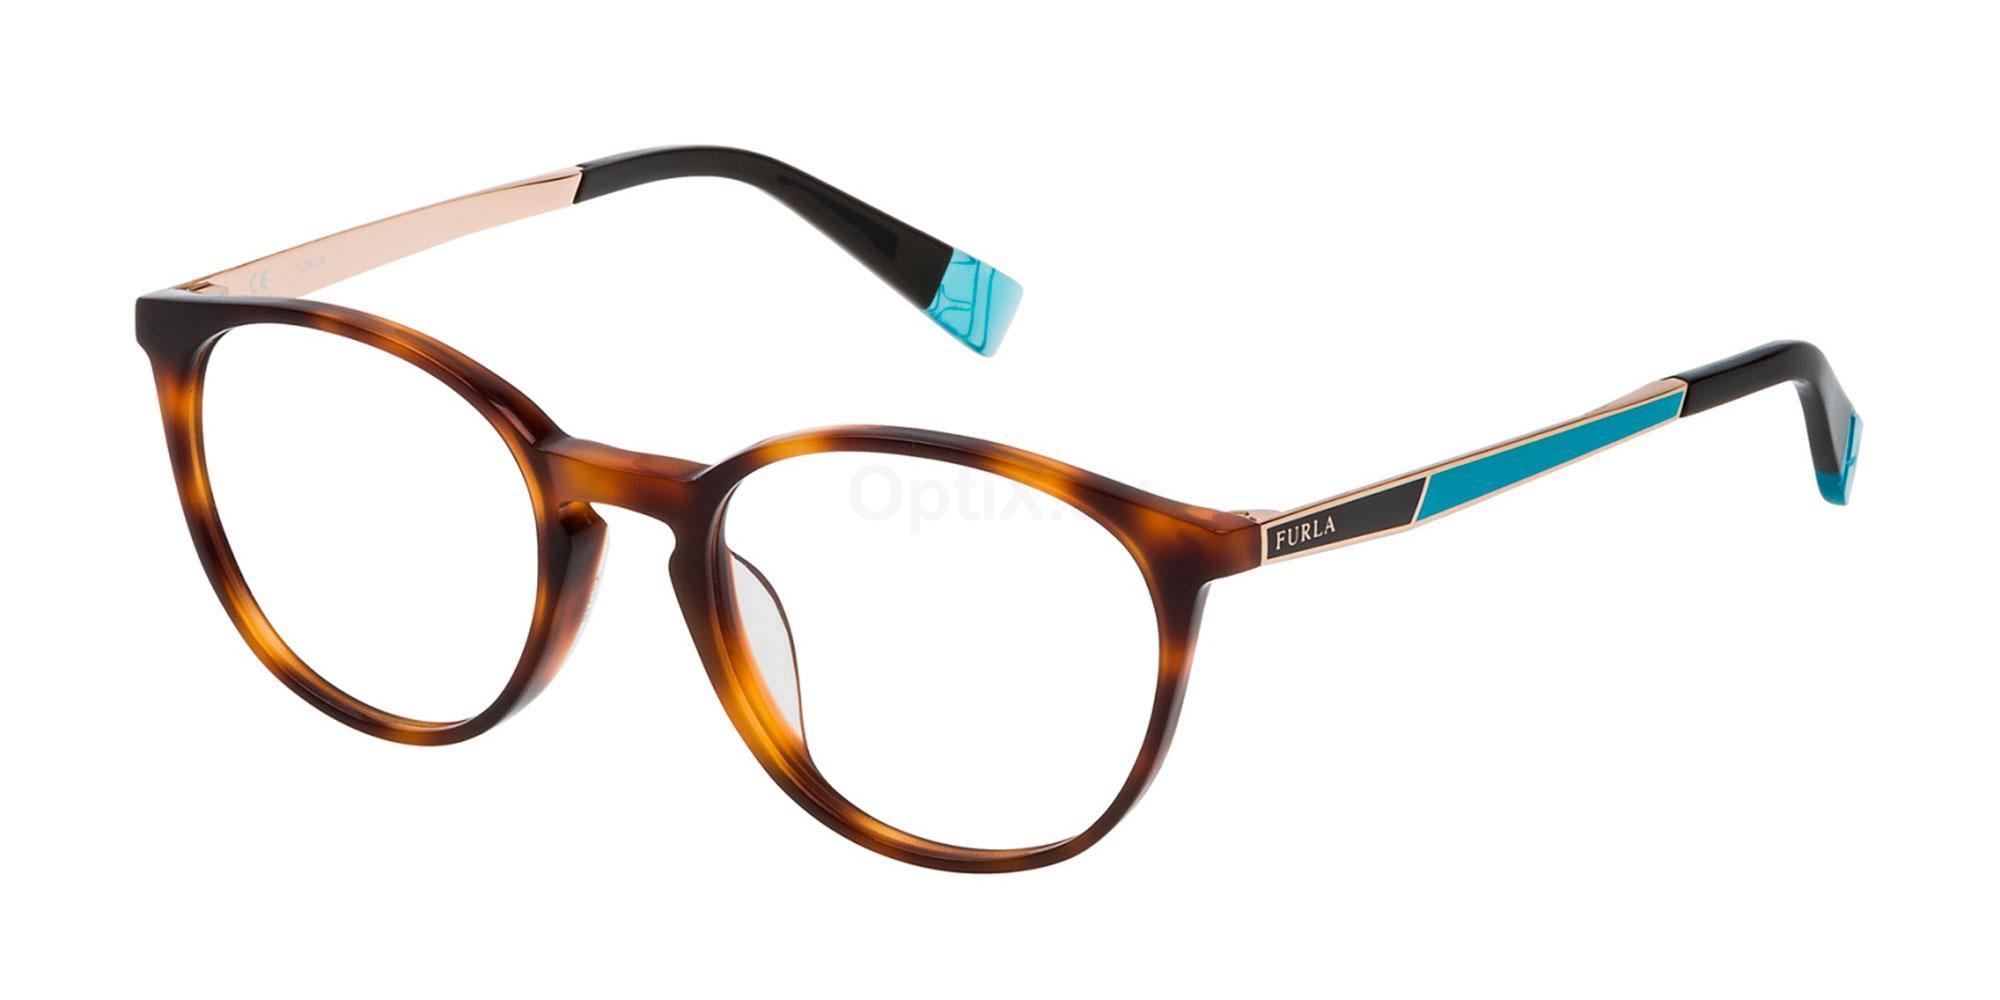 09AJ VFU088 Glasses, Furla